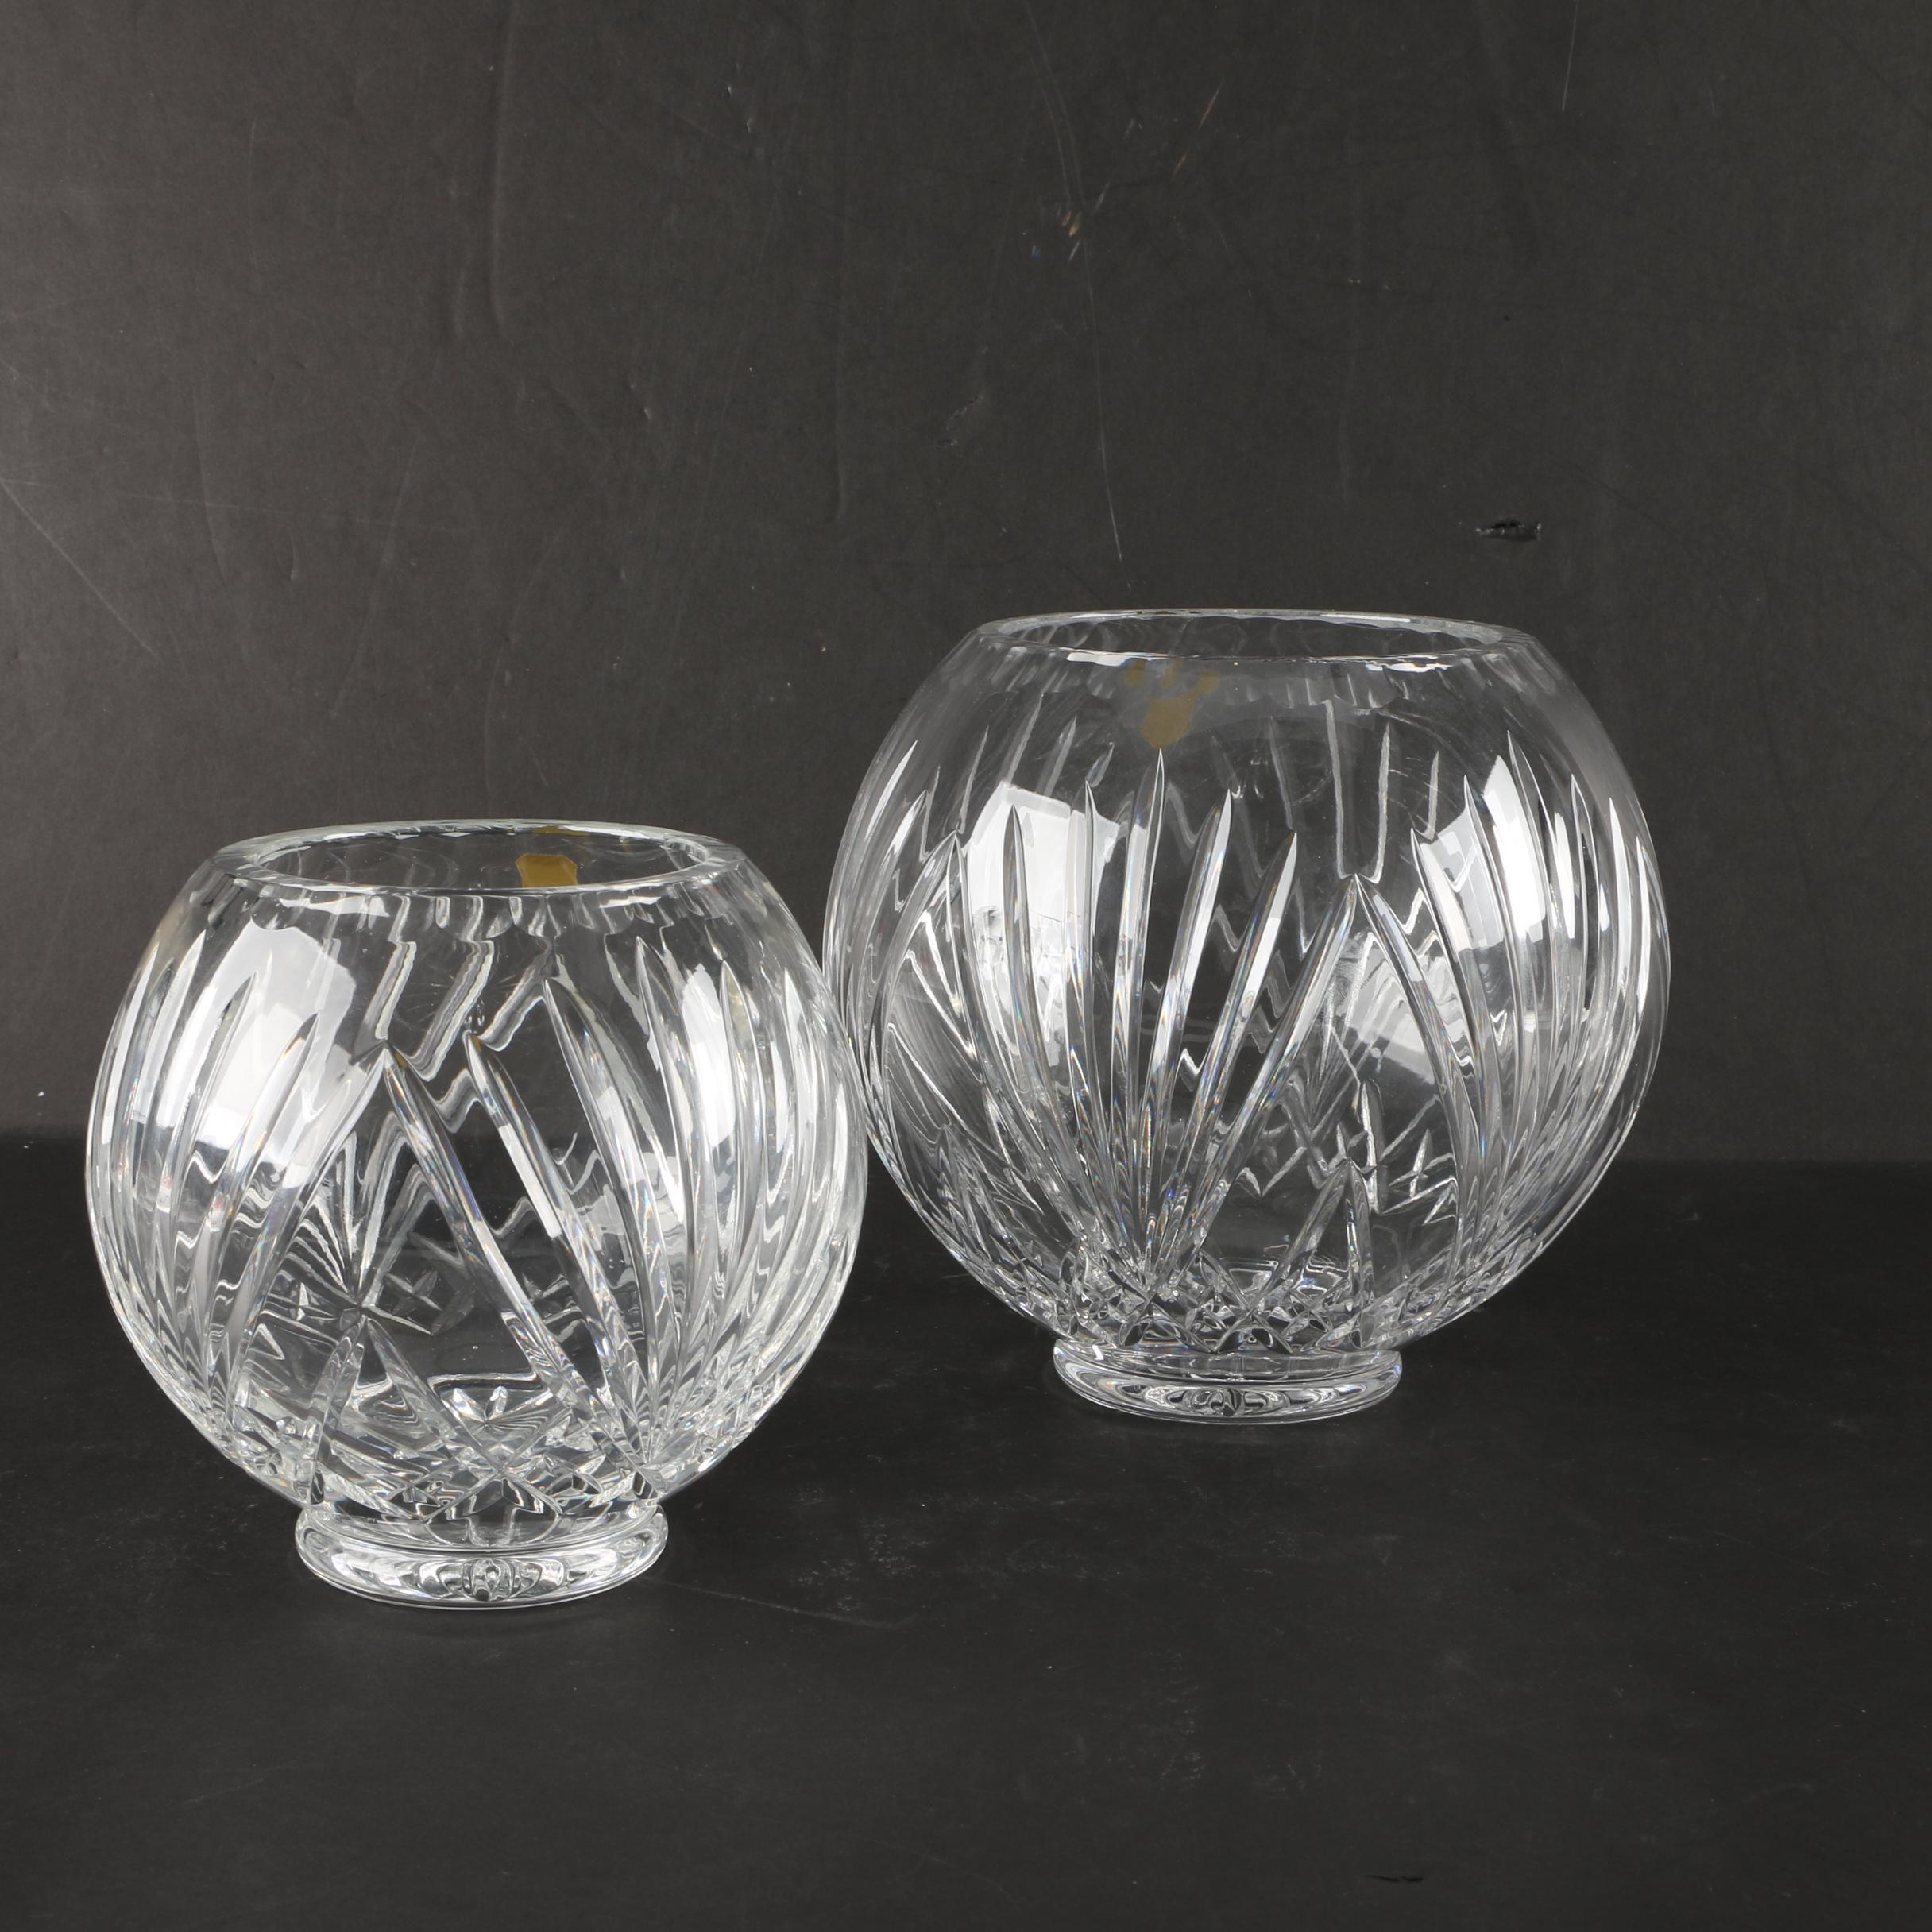 Vintage Hand Cut Leaded Crystal Rose Bowl Vases